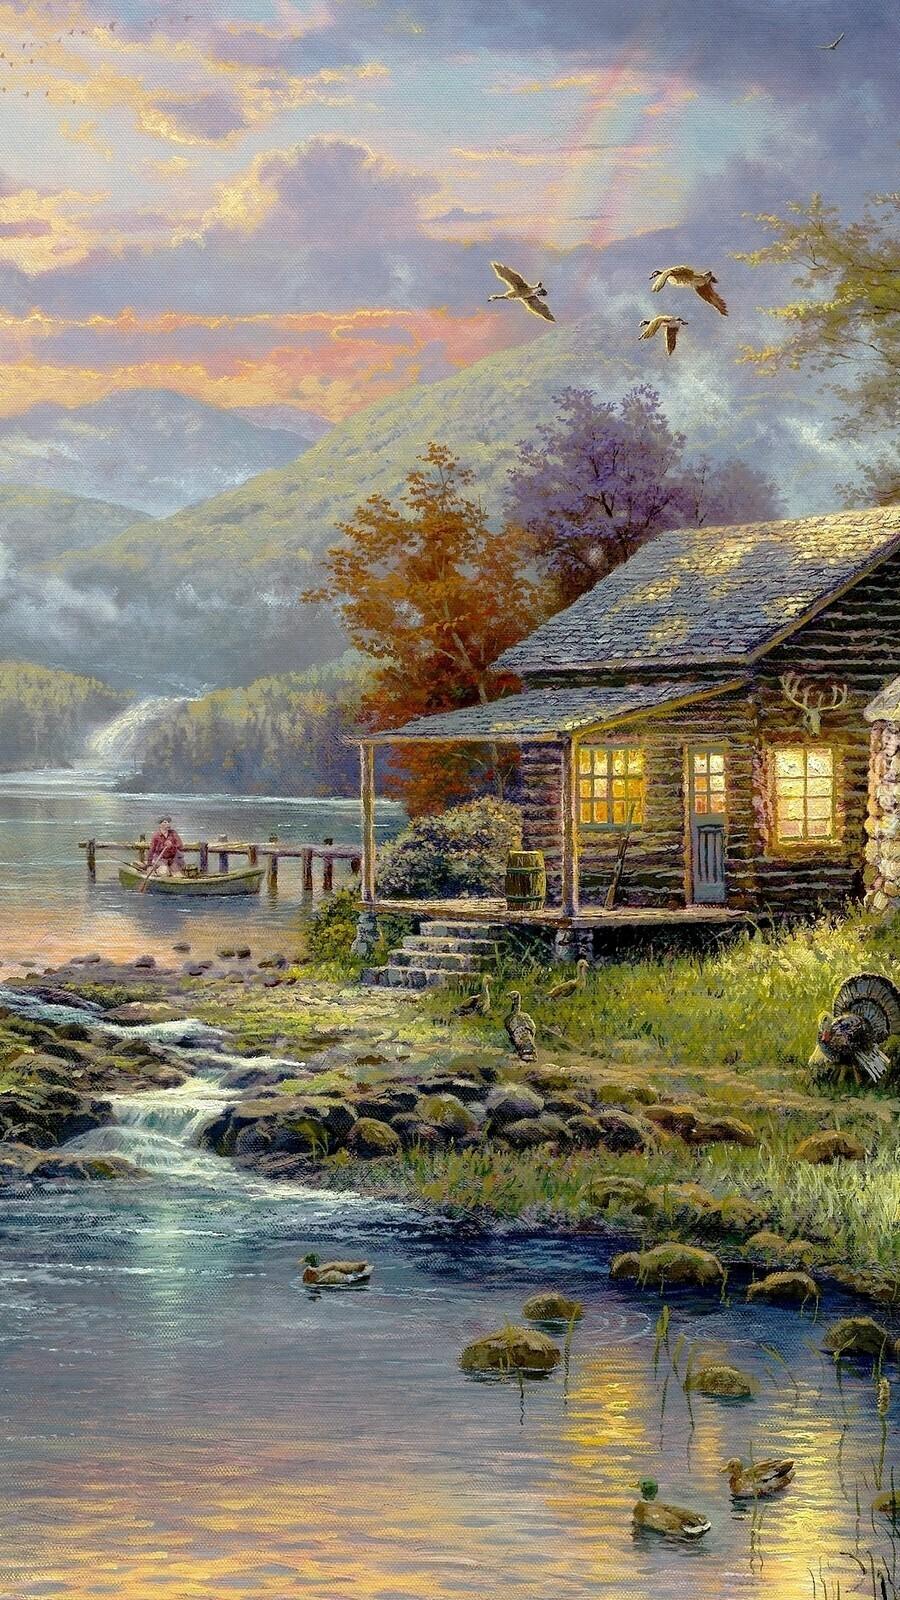 Domek nad jeziorem w obrazie Thomasa Kinkade